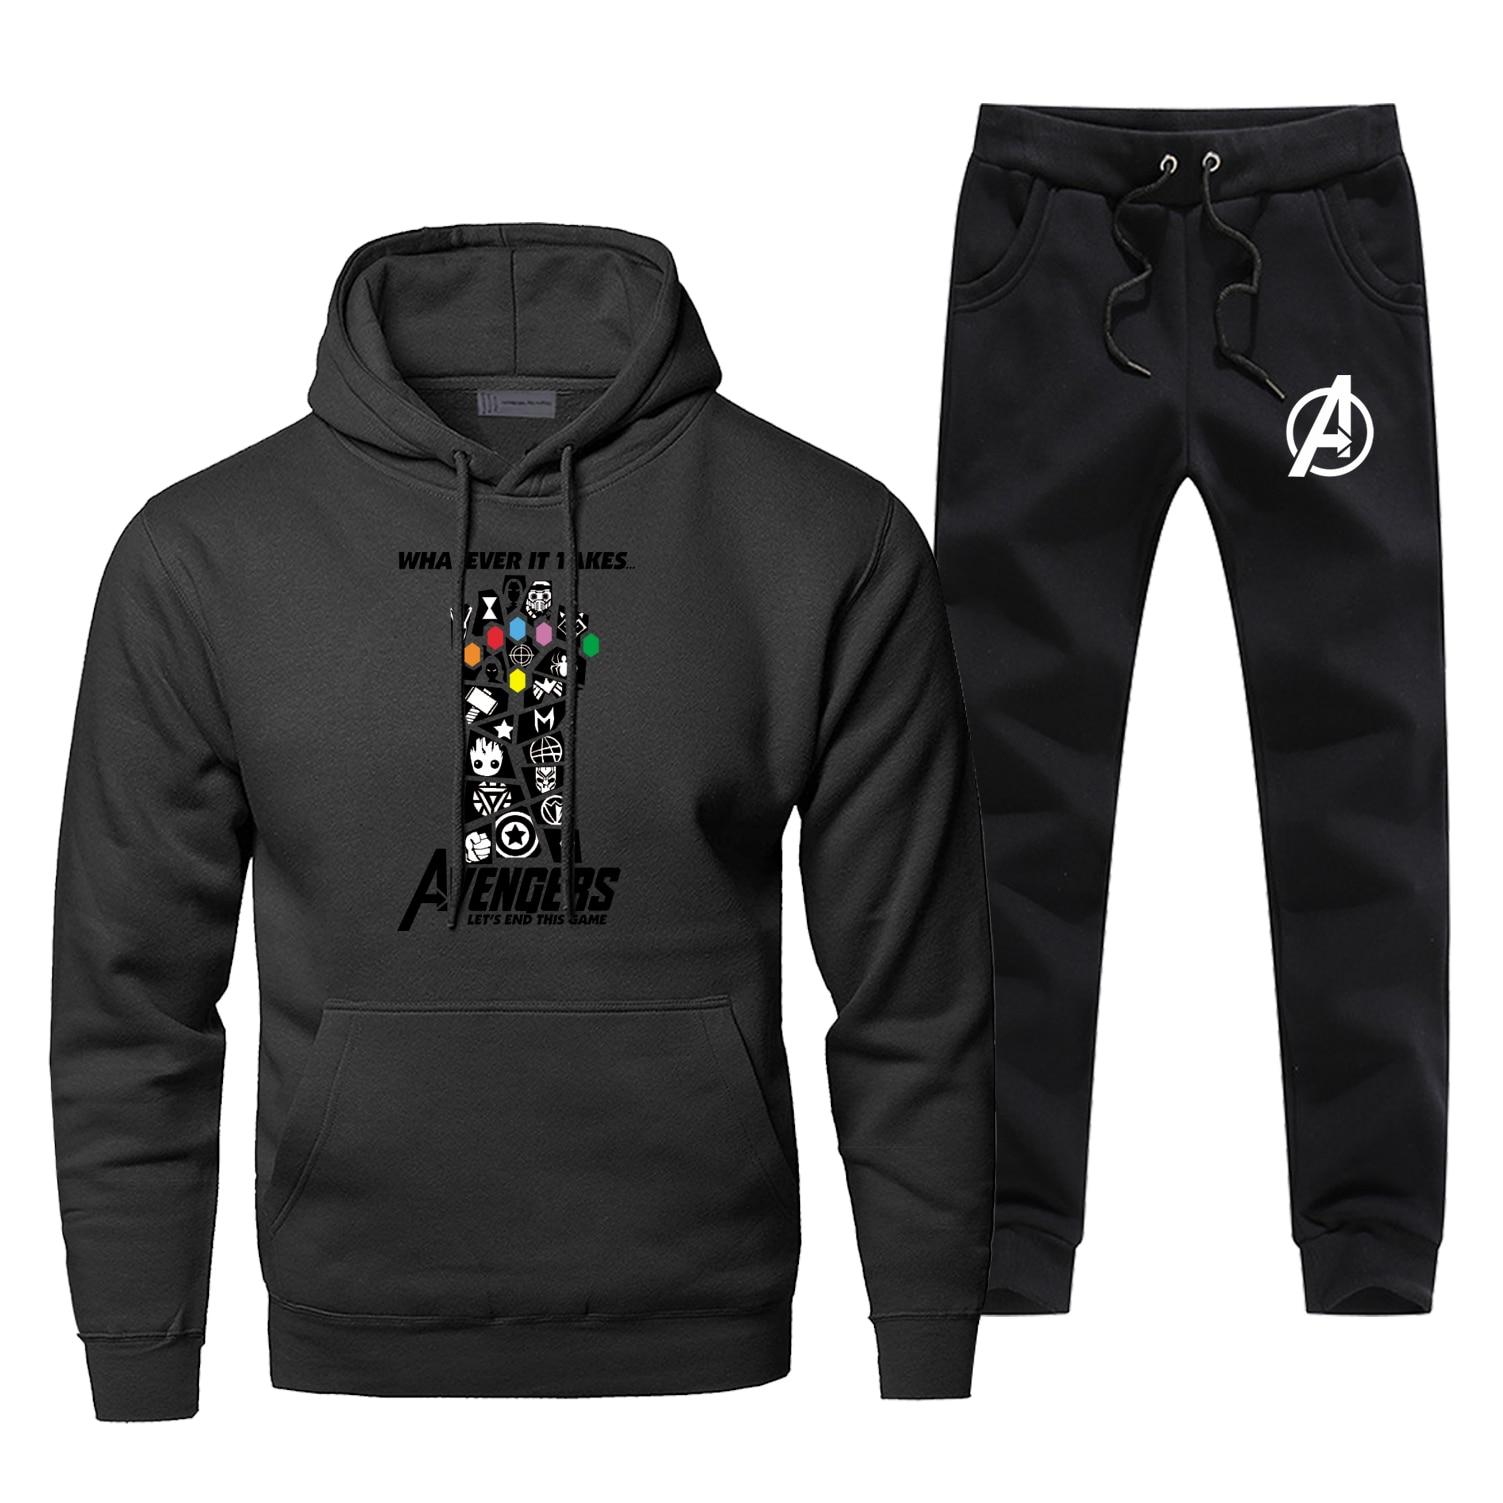 Marvel Avengers Iron Man Hoodies Tony Stark Sweatshirt Infinity Gauntlet Hoodies+pants Two Piece Sets Men Streetwear Sportswear